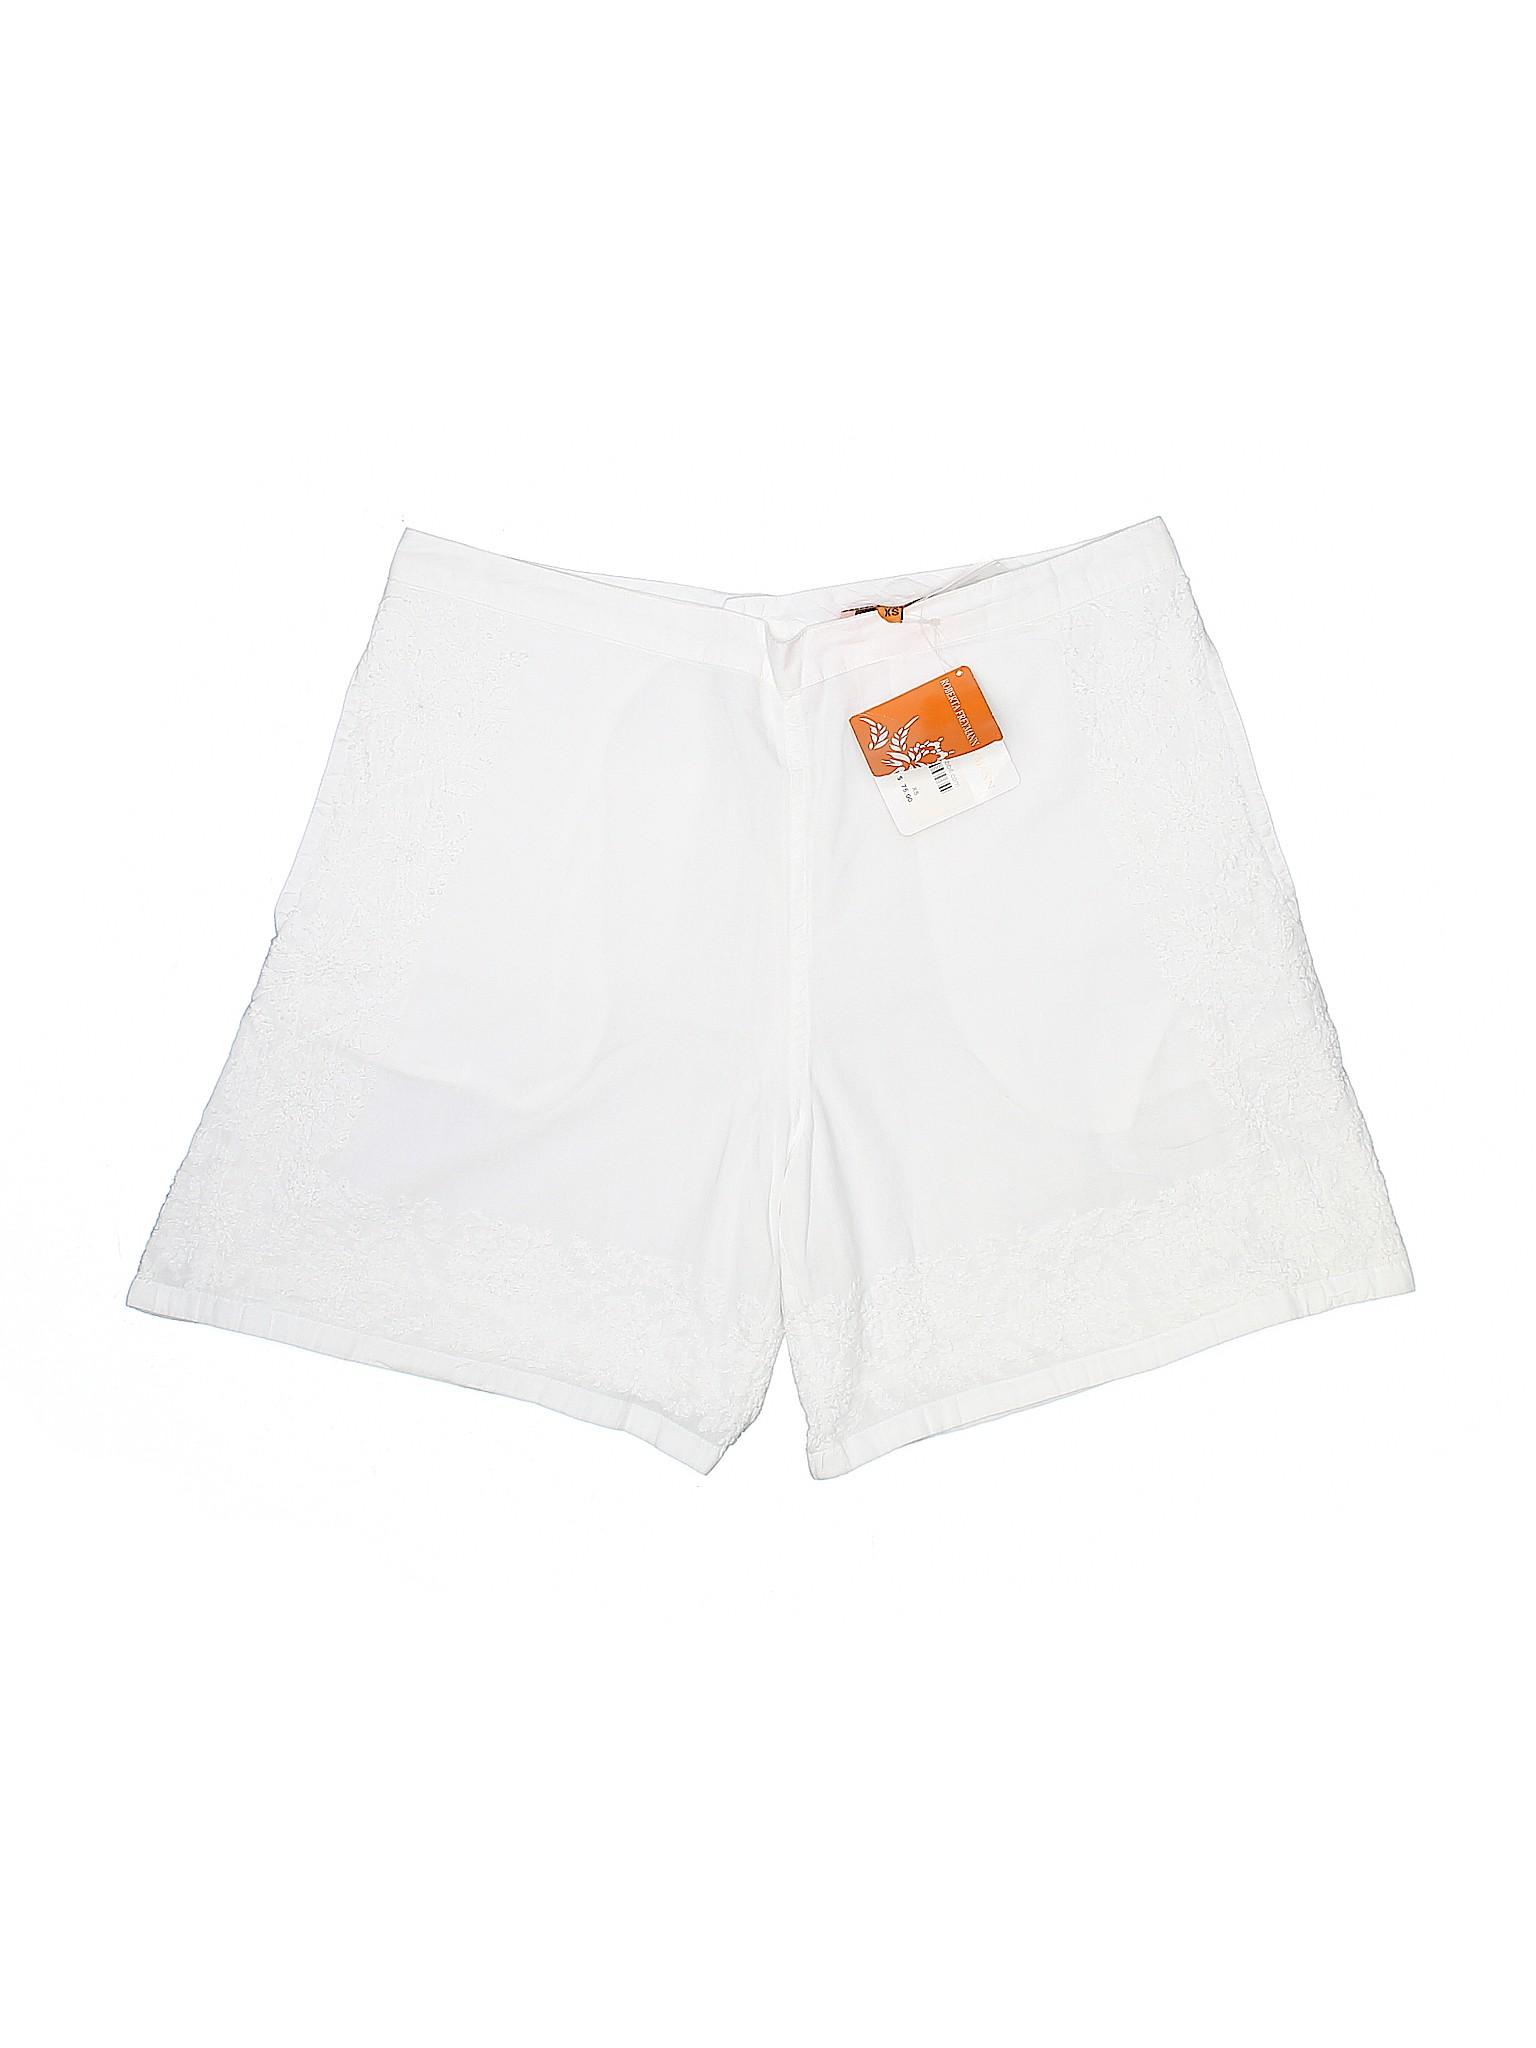 Shorts Roberta Freymann Boutique Roberta Boutique Freymann qaXS7p